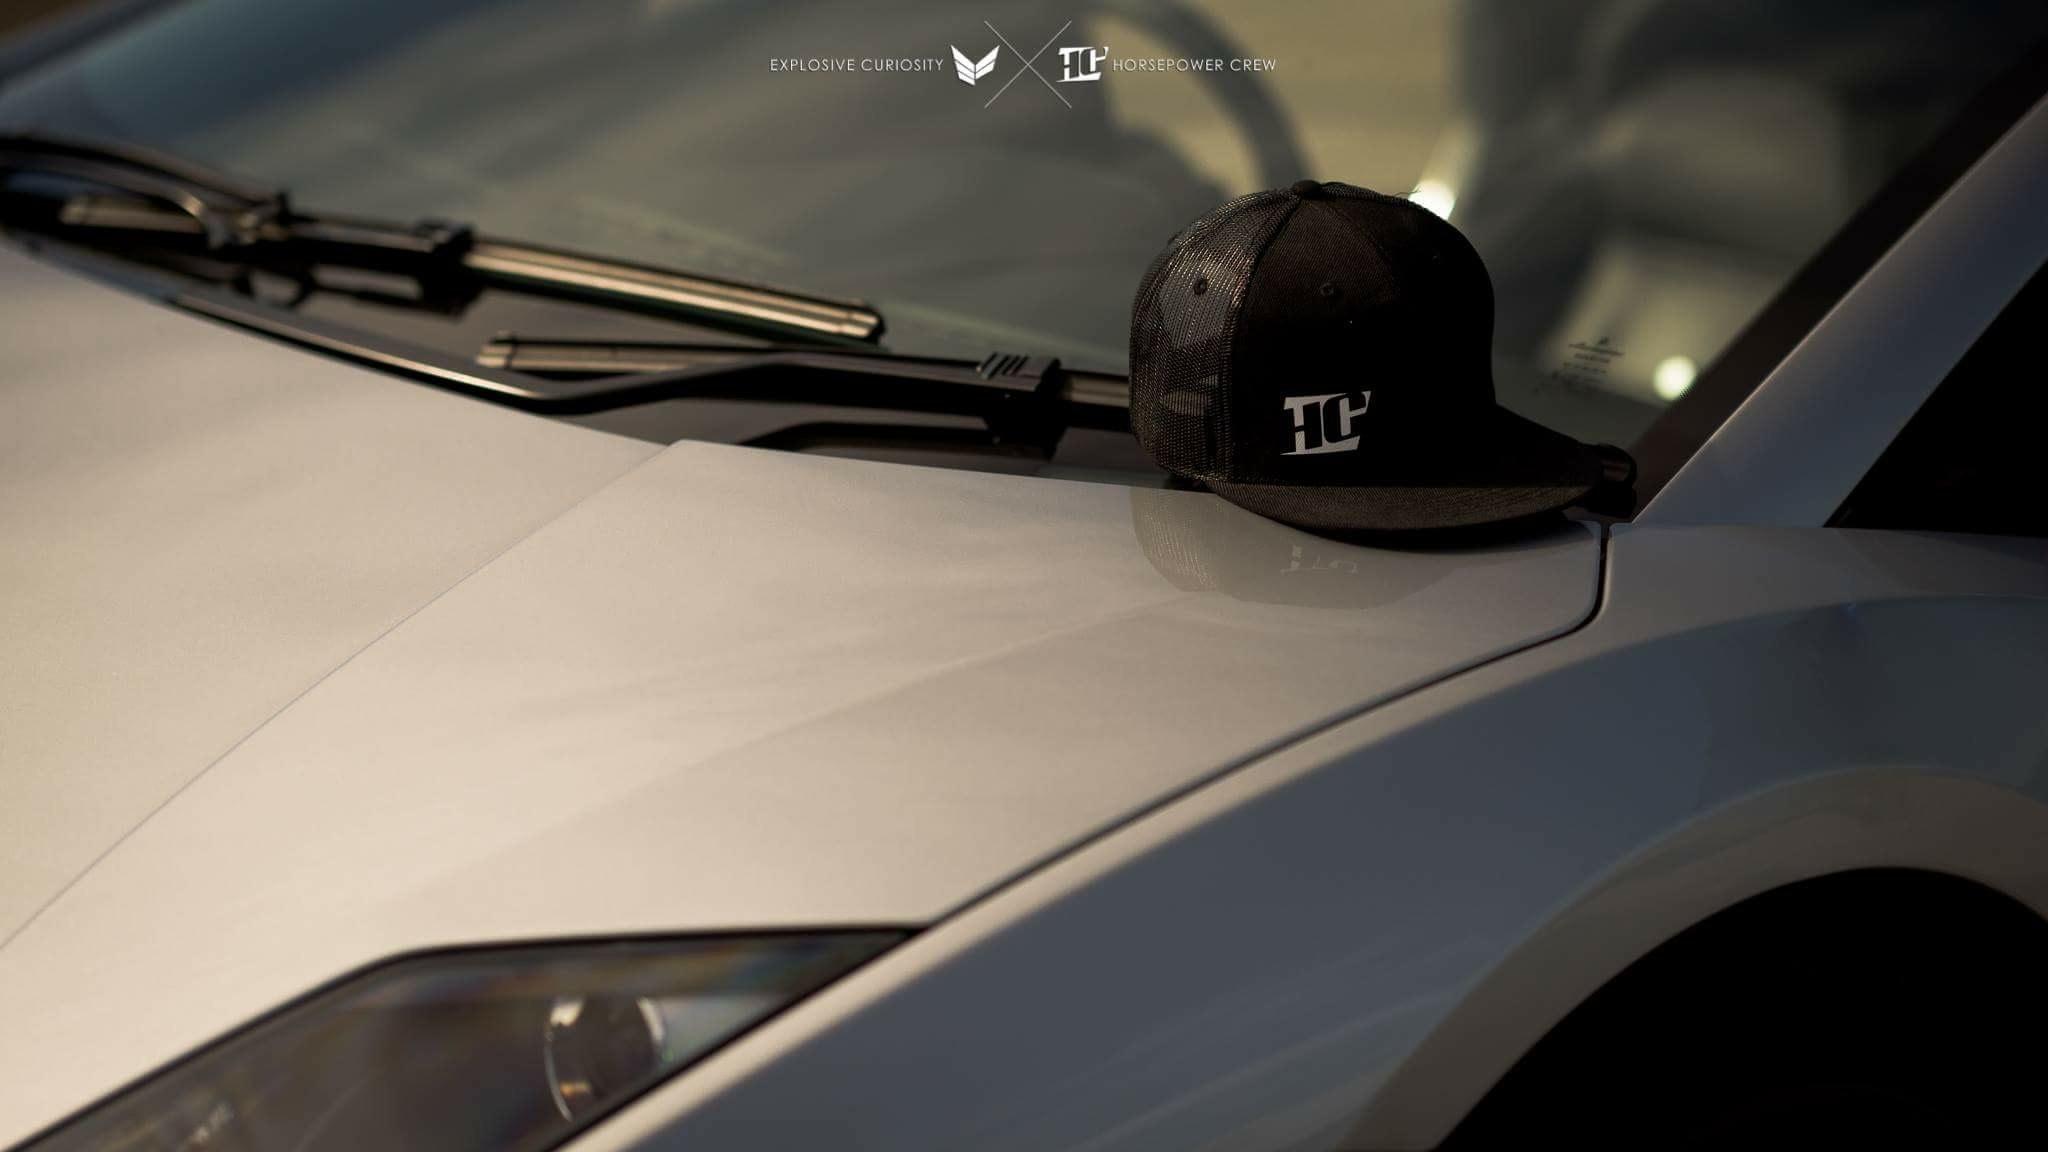 Hat-black-with-white-HC-on-lambo-angle